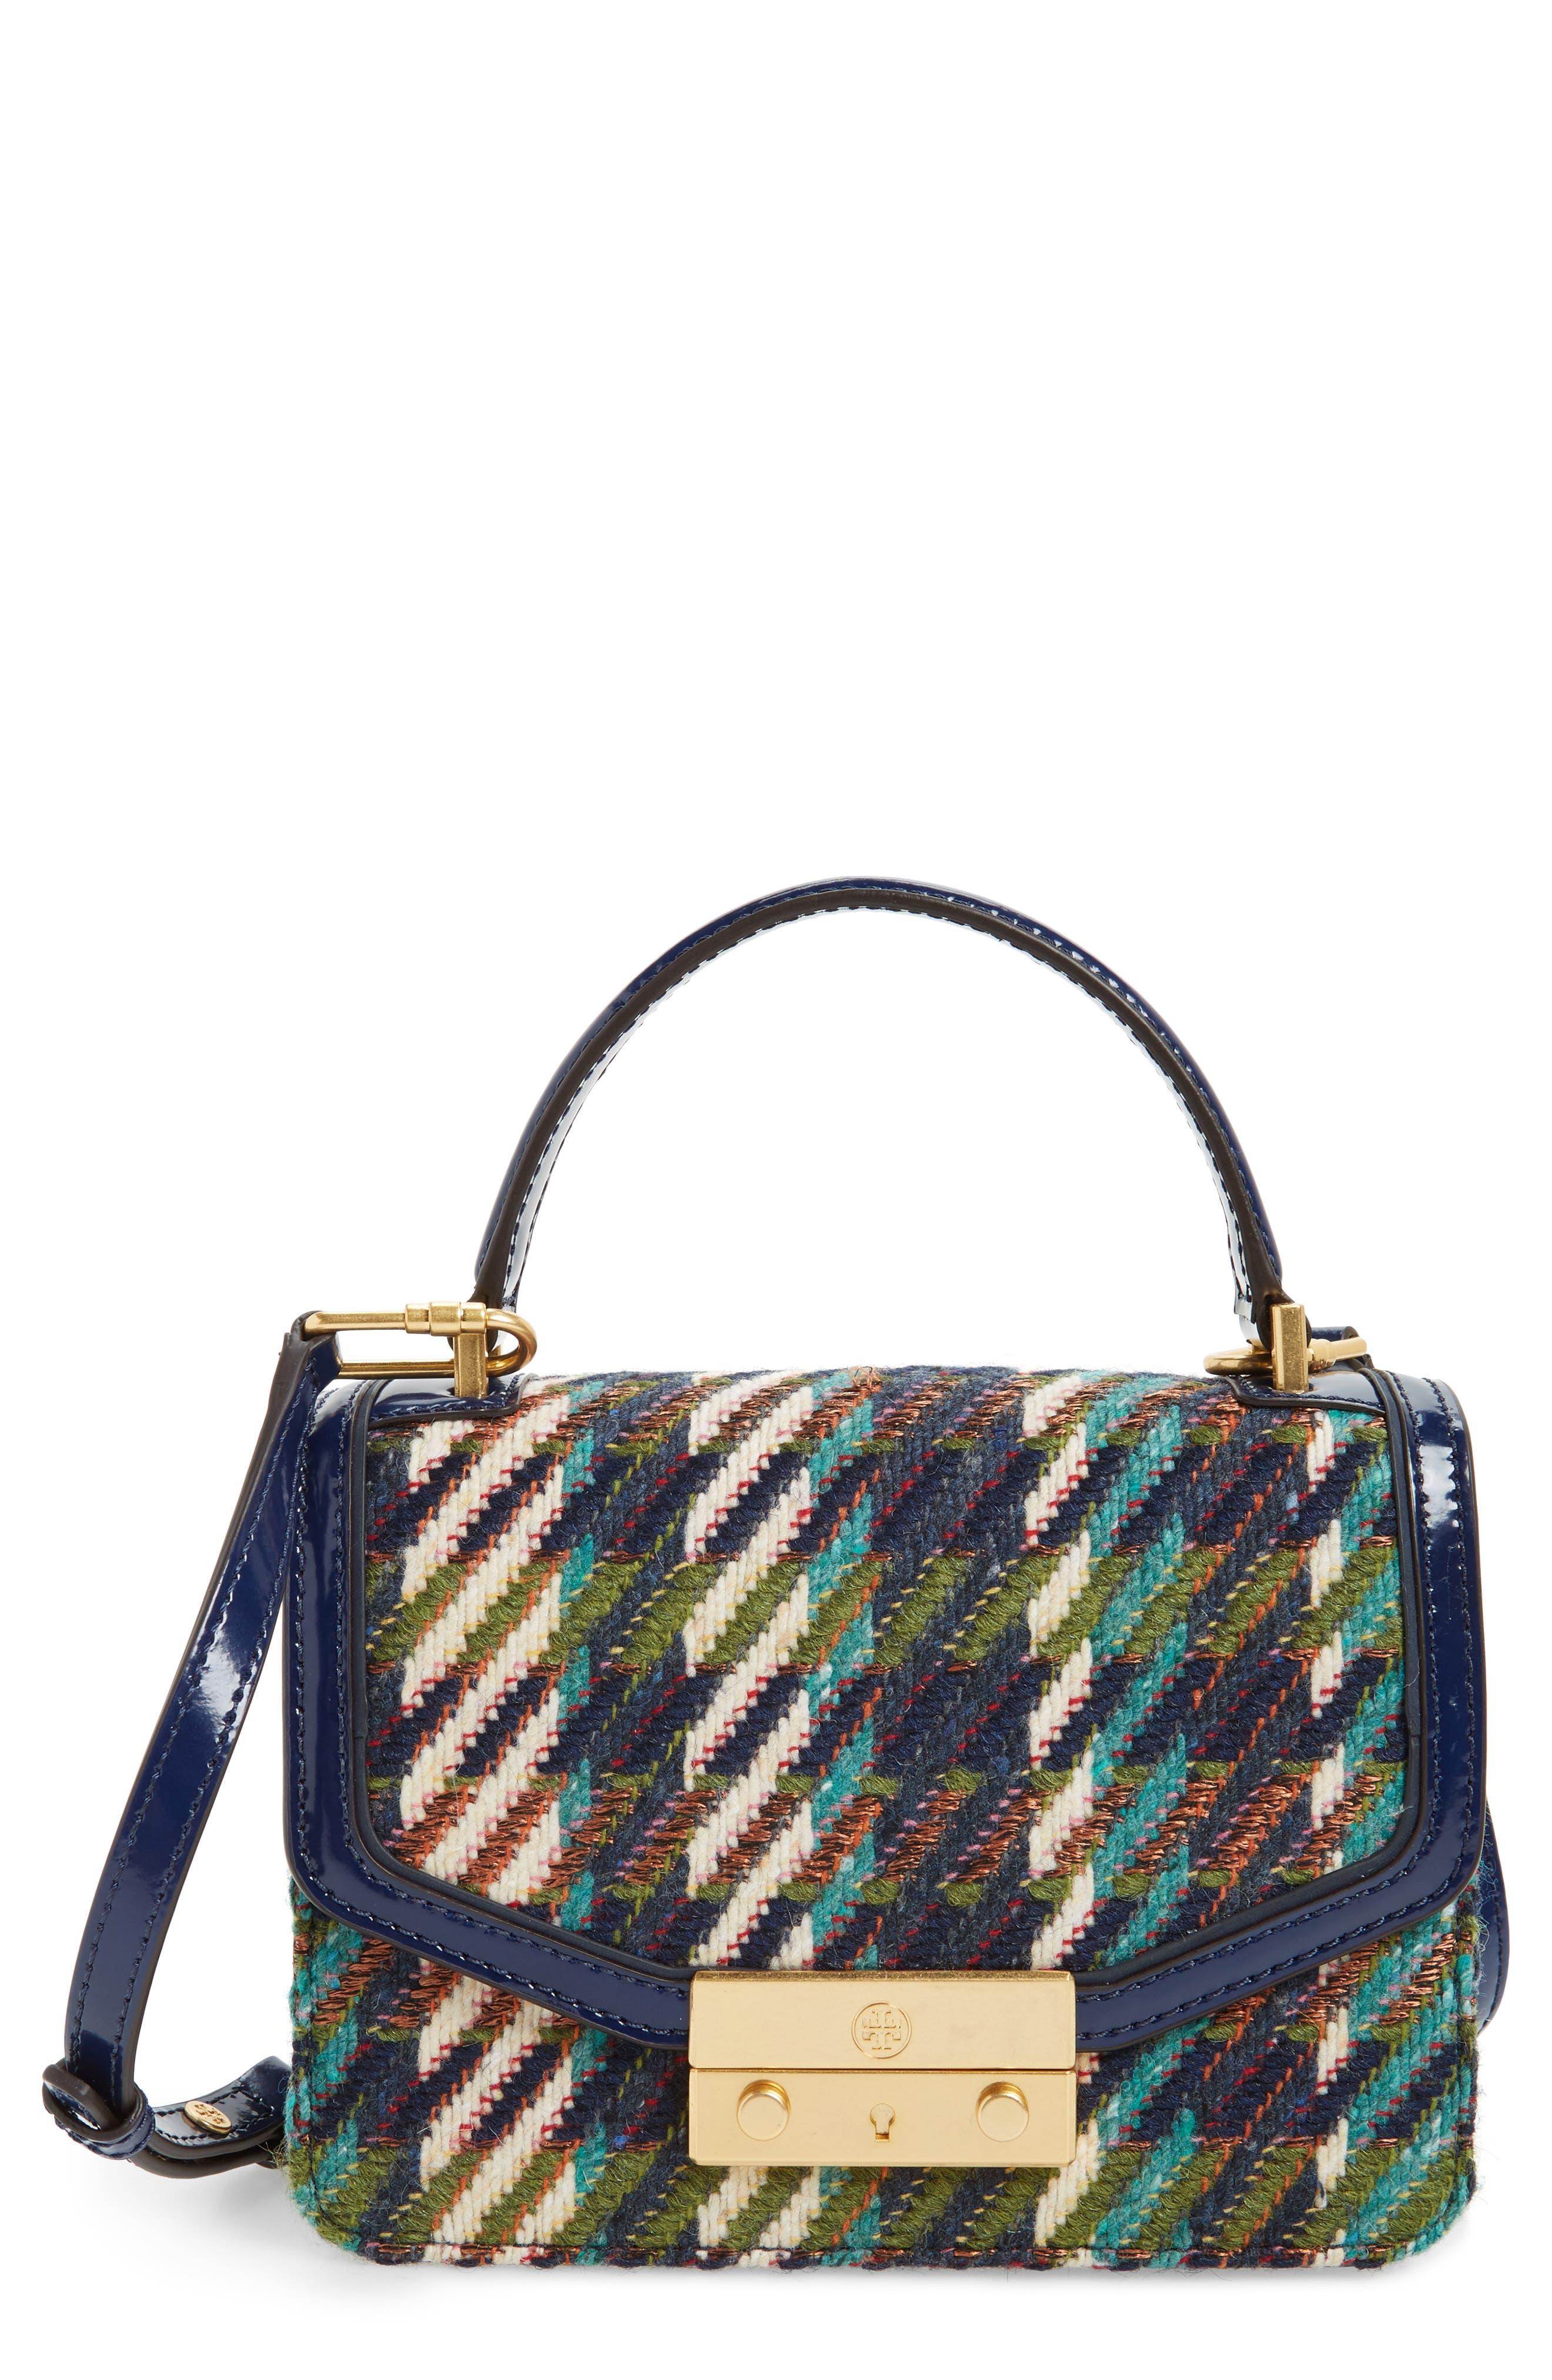 Tory Burch Juliette Tweed Top Handle Crossbody Bag